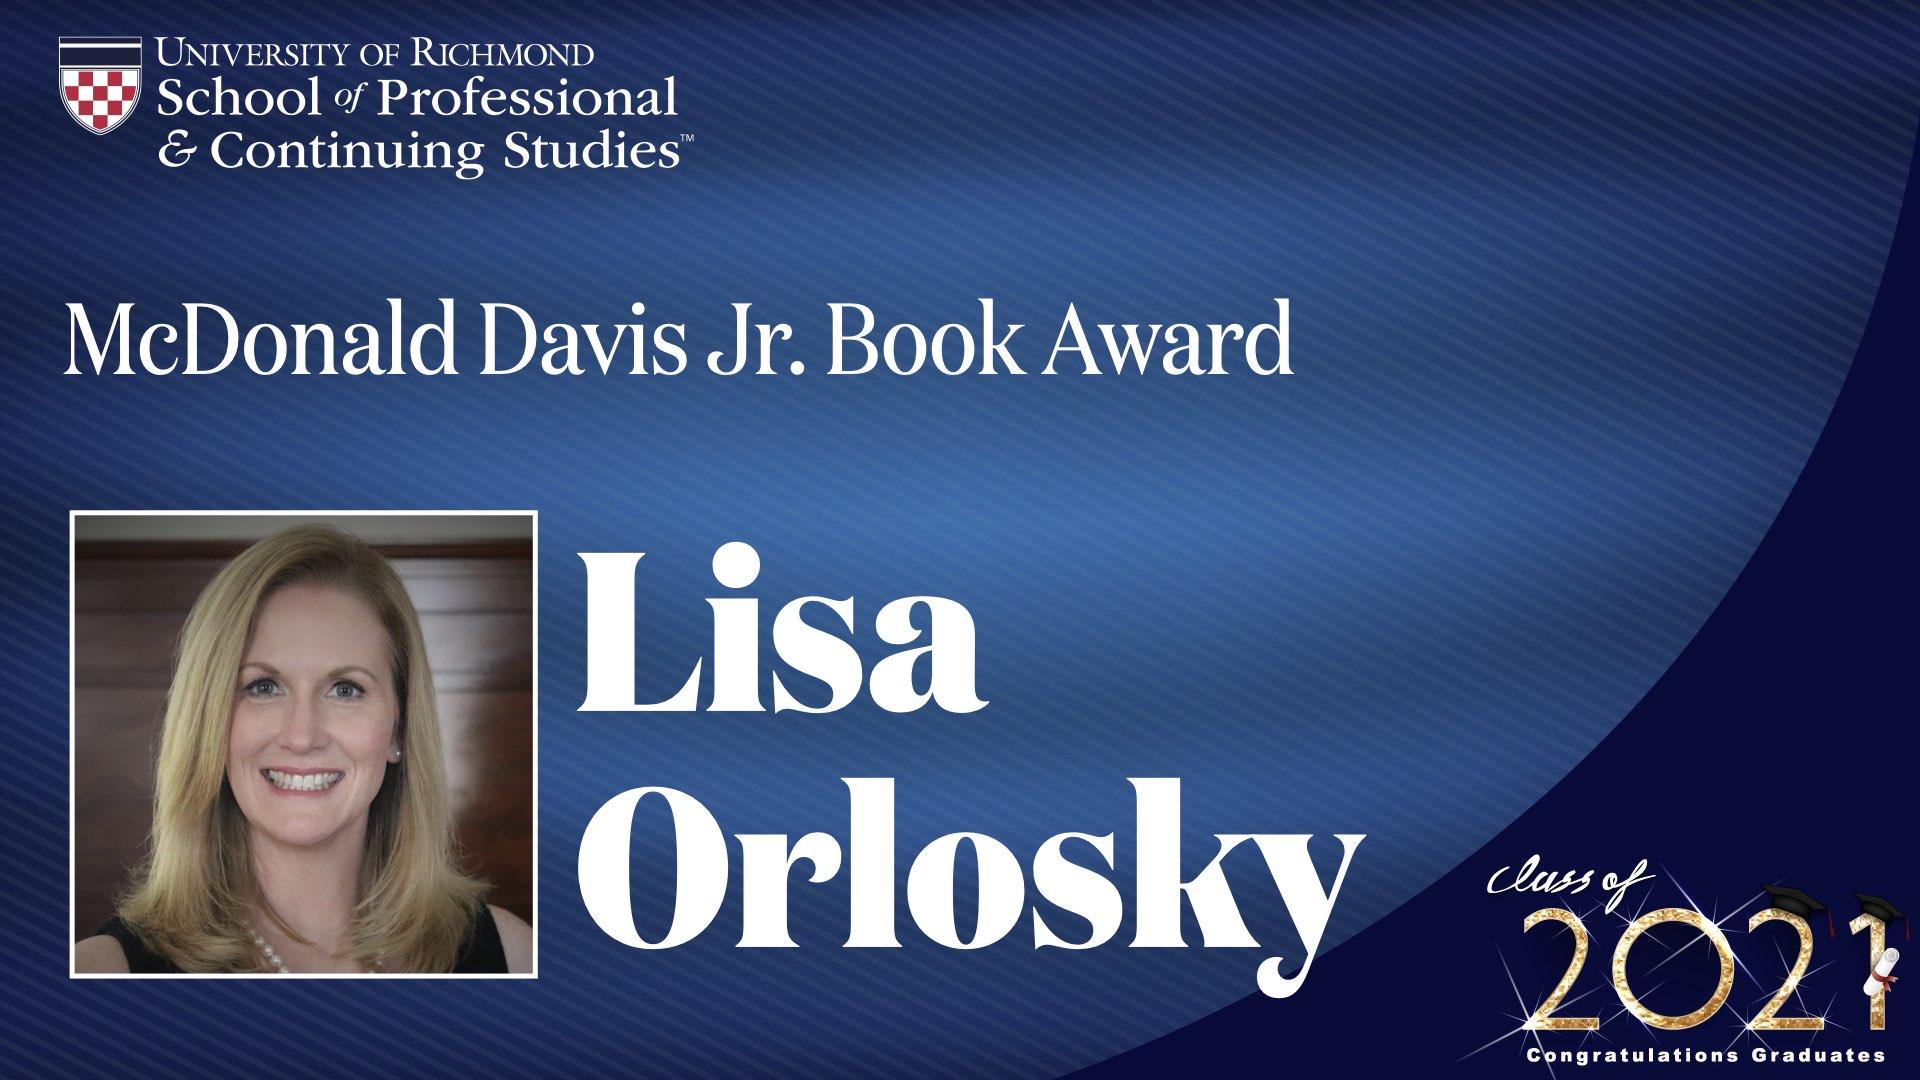 Lisa Orlosky headshot with award name